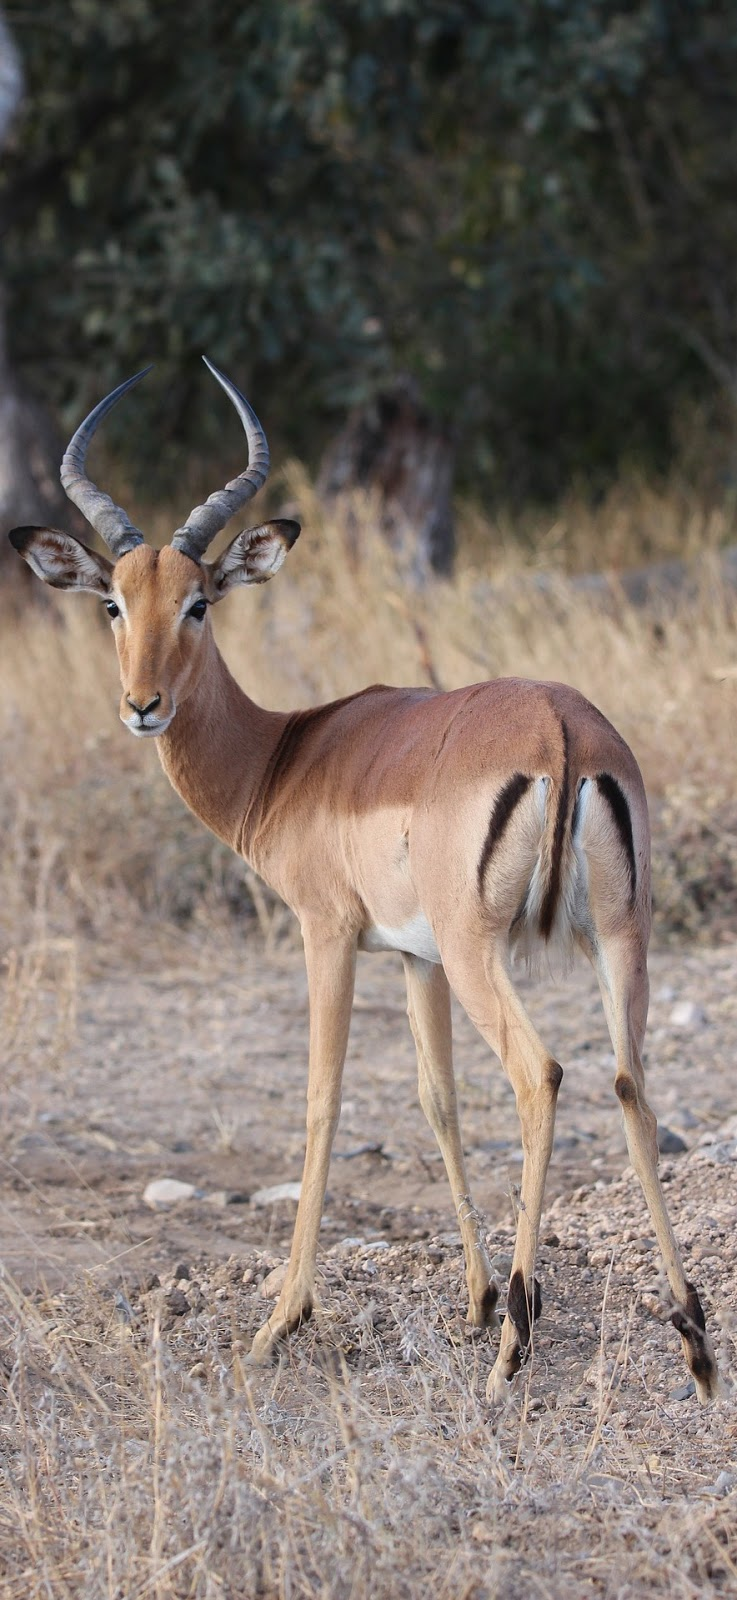 A curious impala.